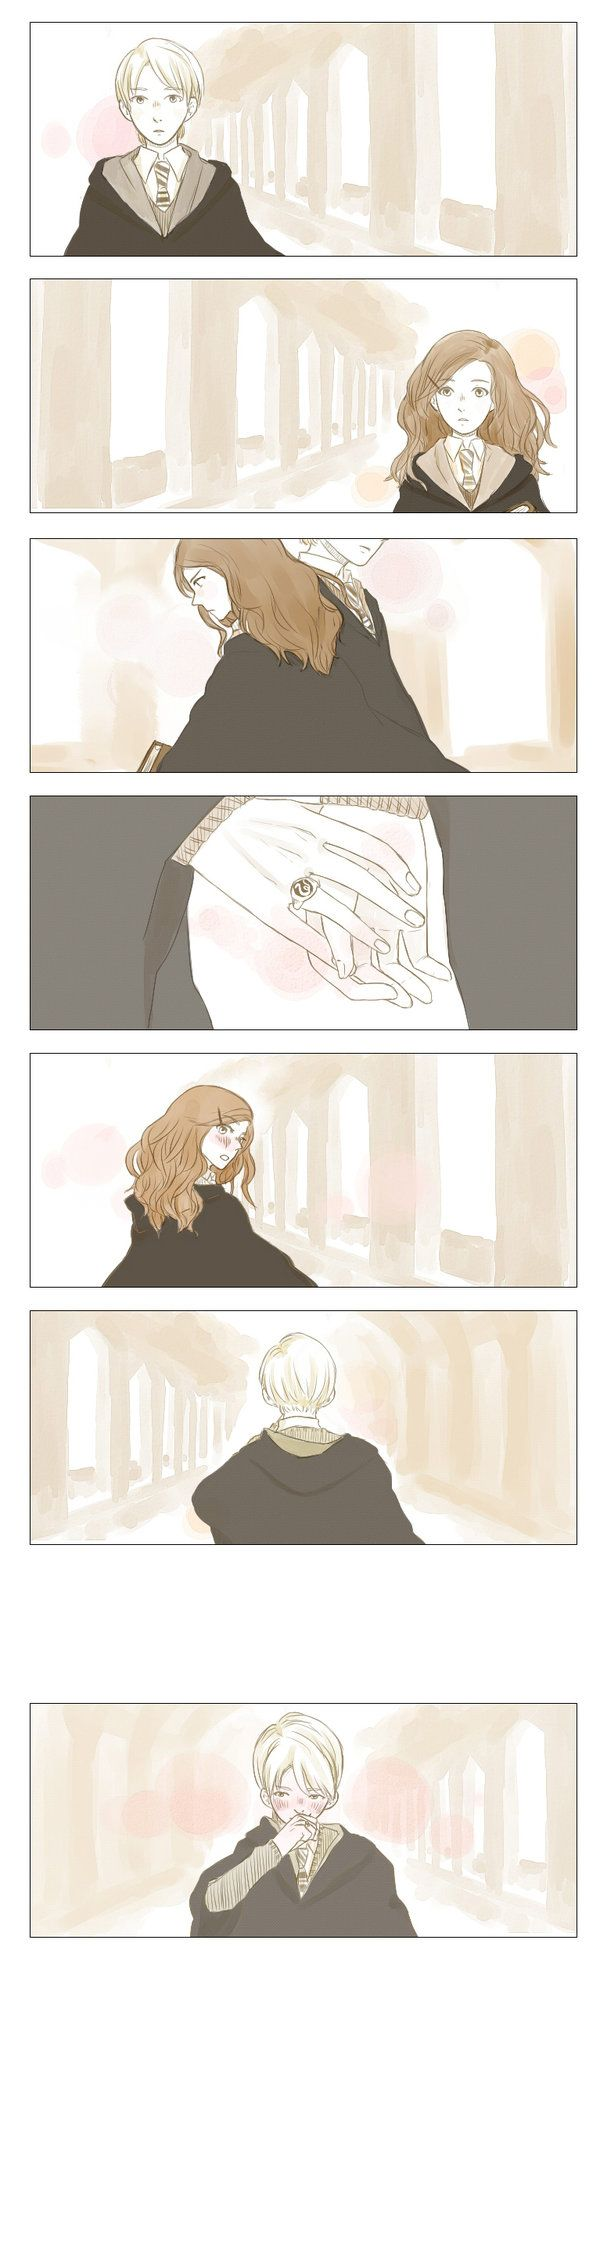 Draco Malfoy and Hermione. Dramione by TatarTaros on DeviantArt